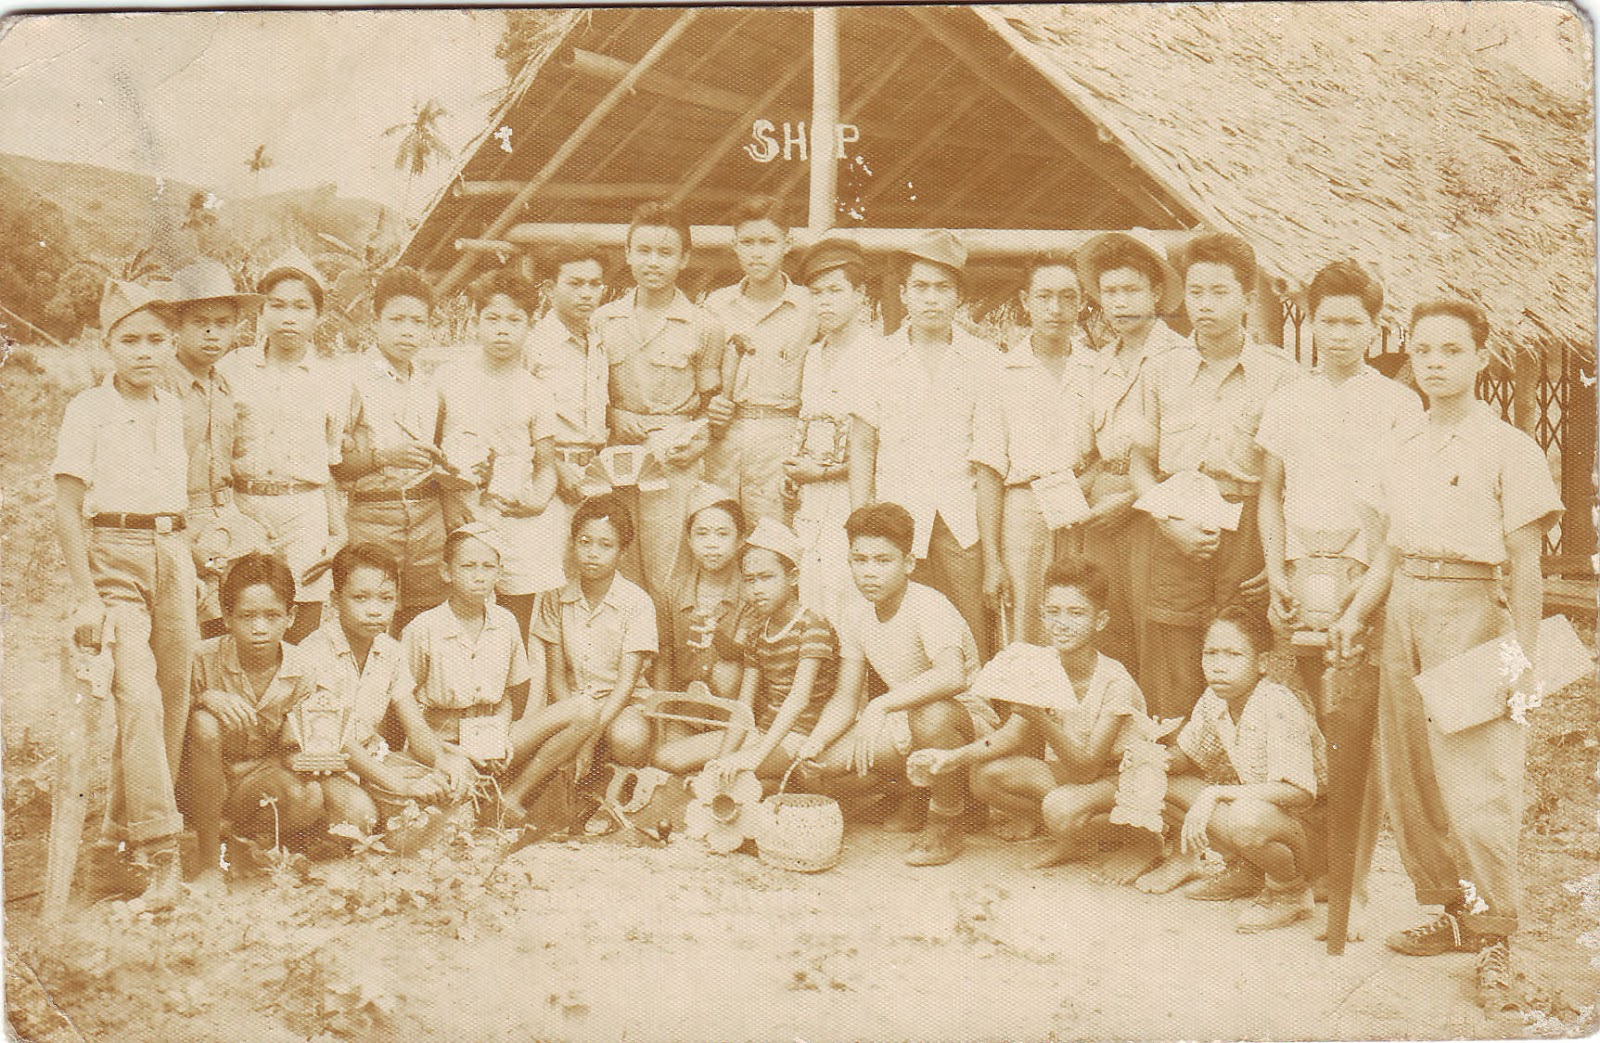 The Intellectual Migrant-Autobiography of a Filipino